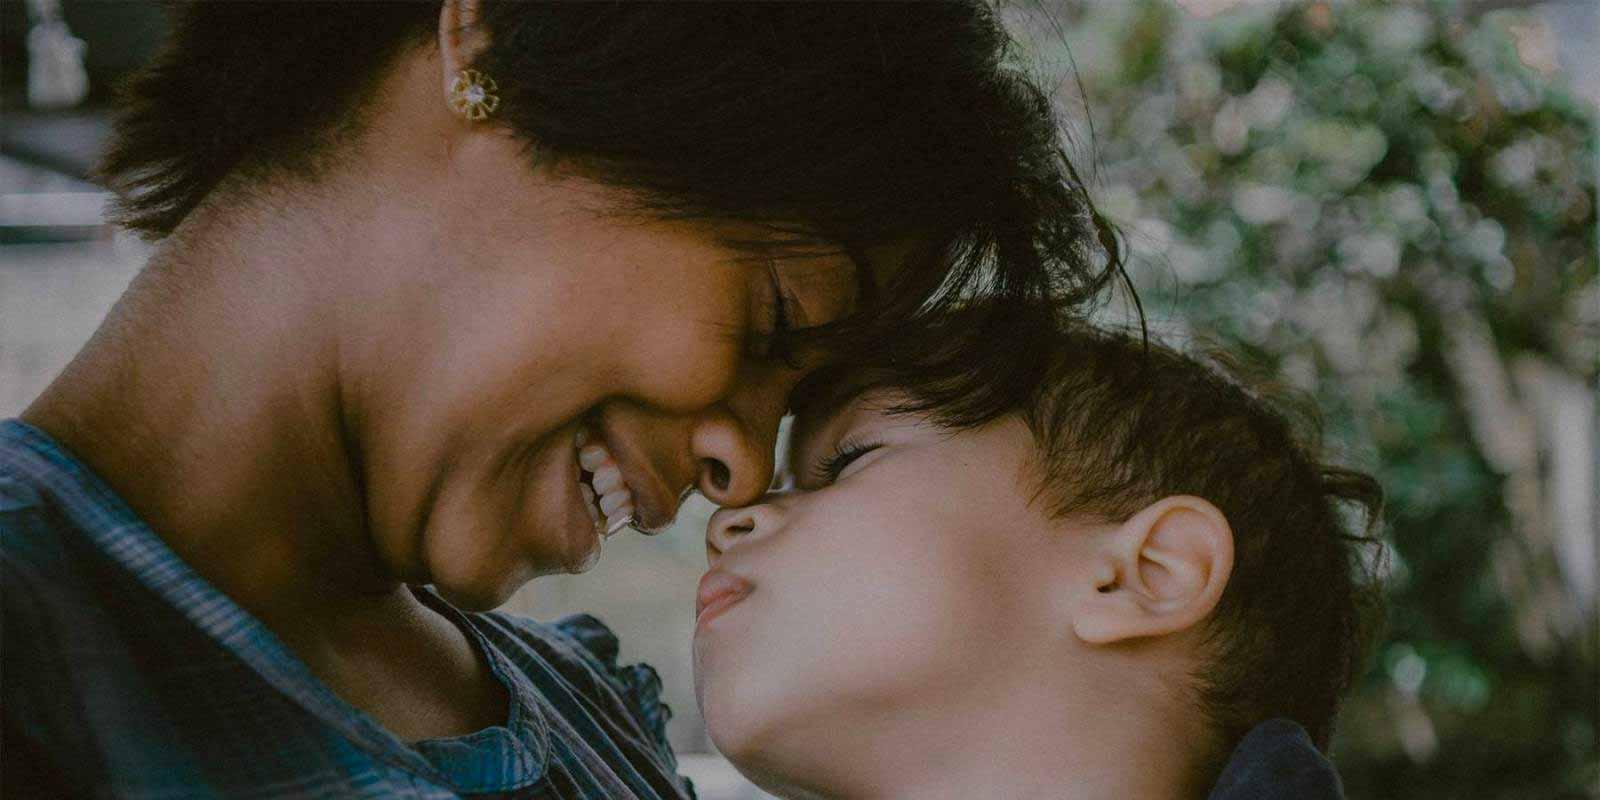 Woman caressing Child